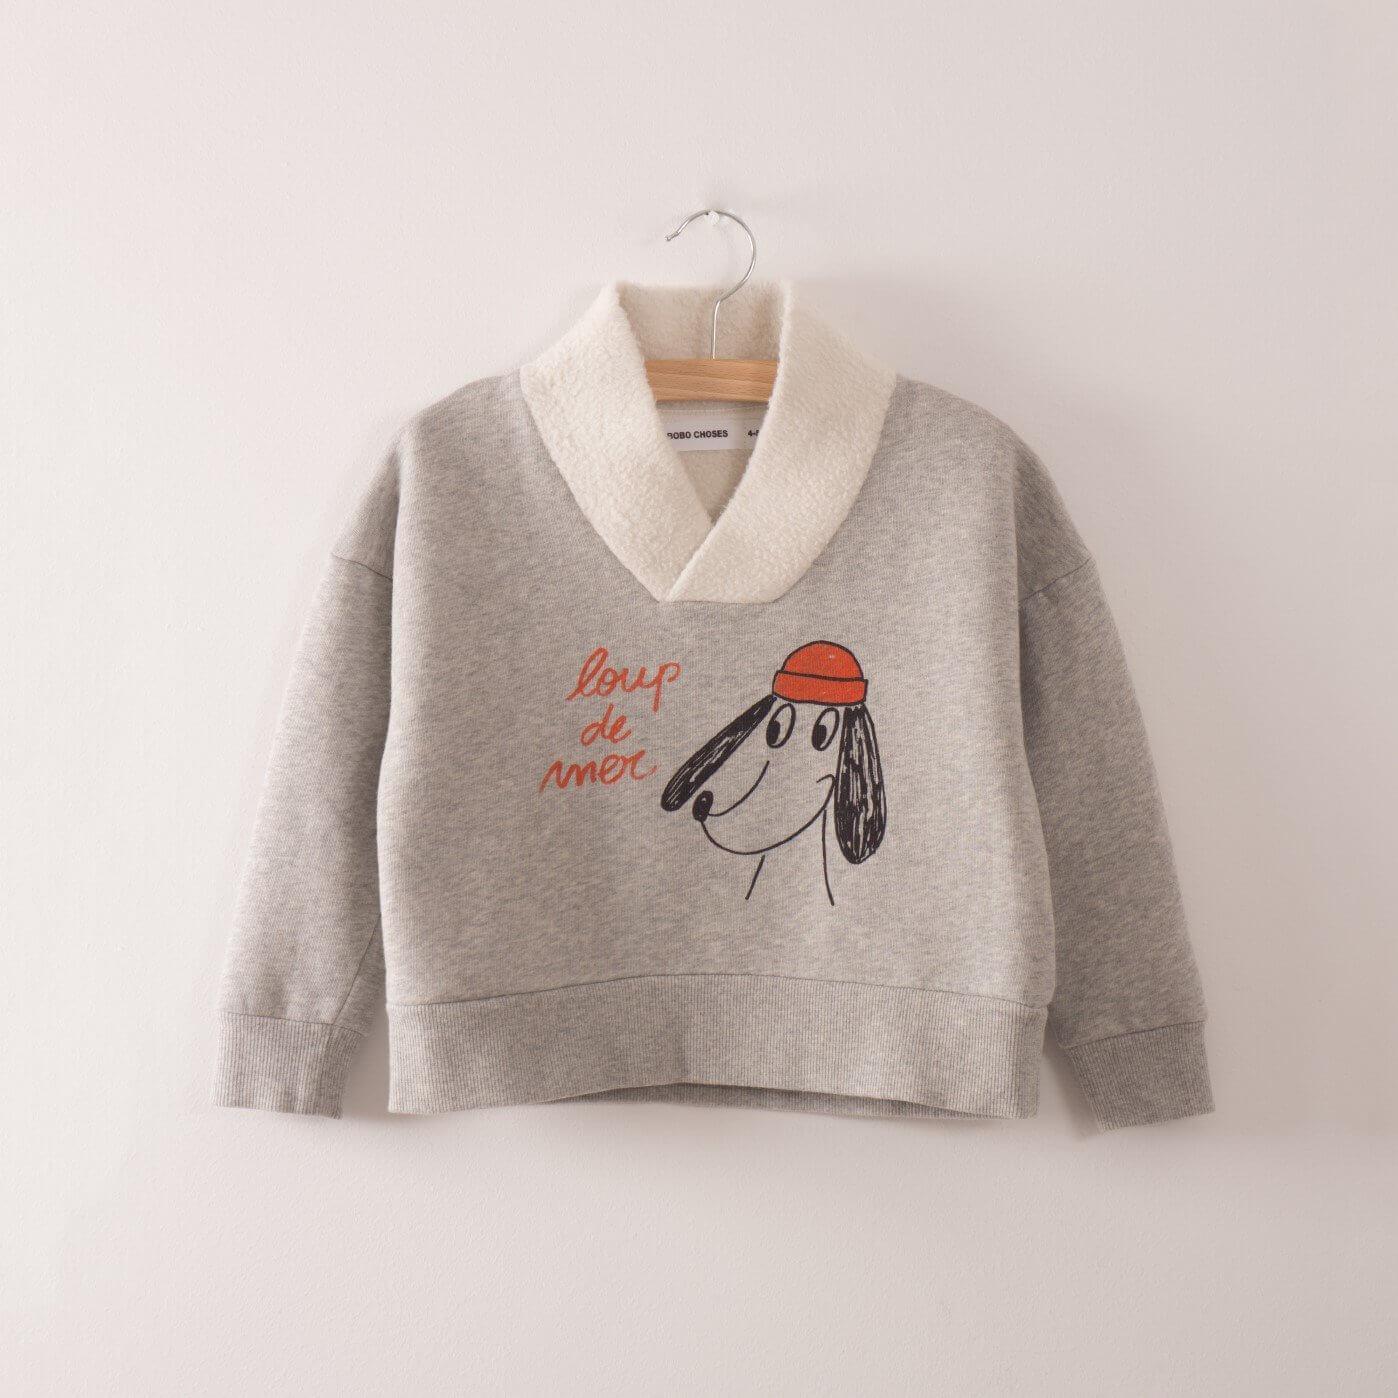 BOBO CHOSES Fisherman/Seemann Sweatshirt Loup de Mer